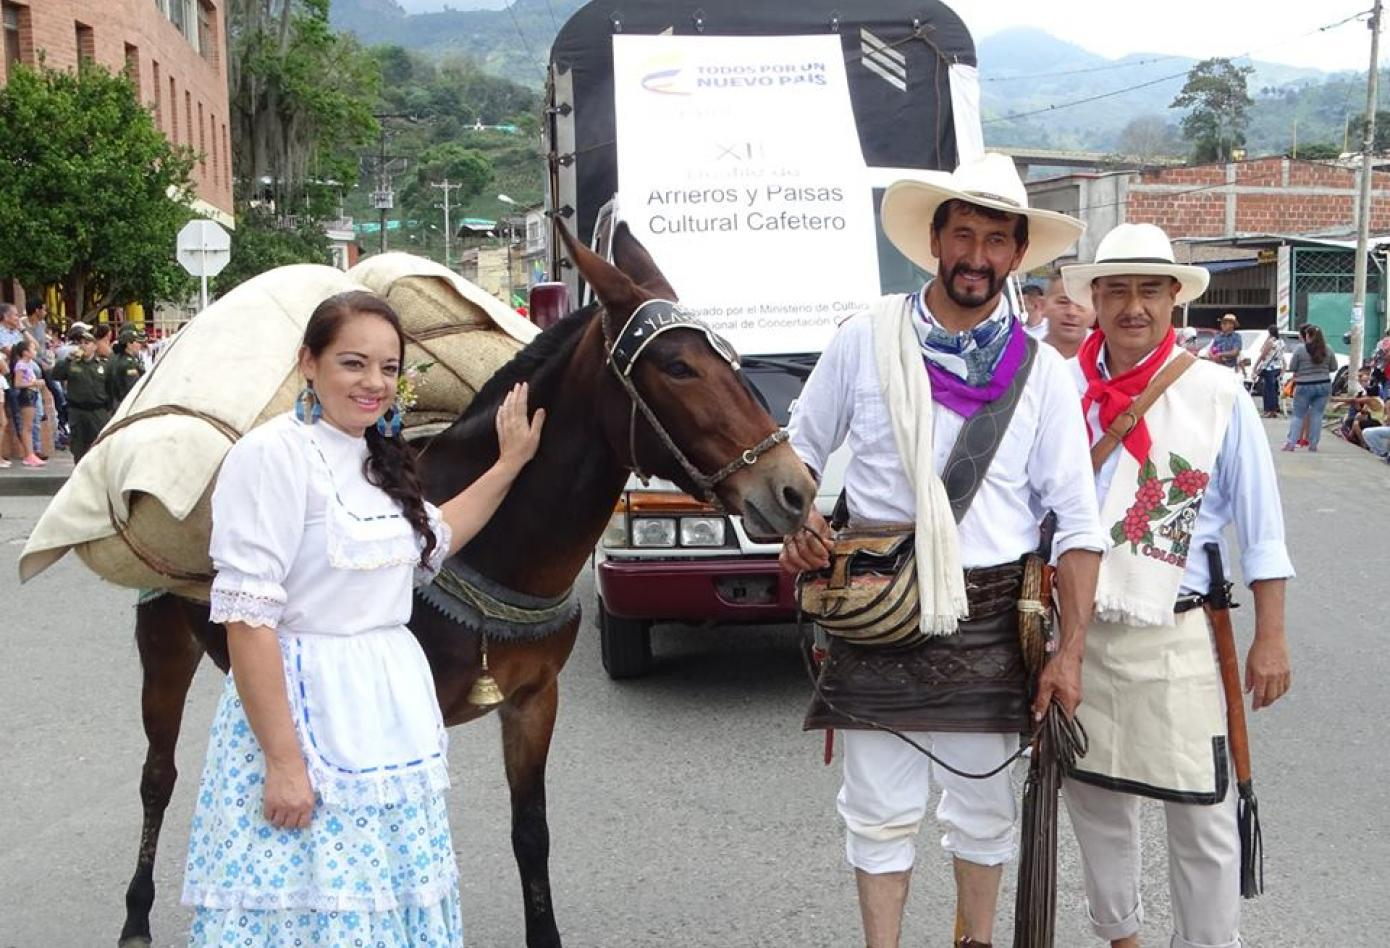 Culturas colombianas. Foto: www.rcnradio.com